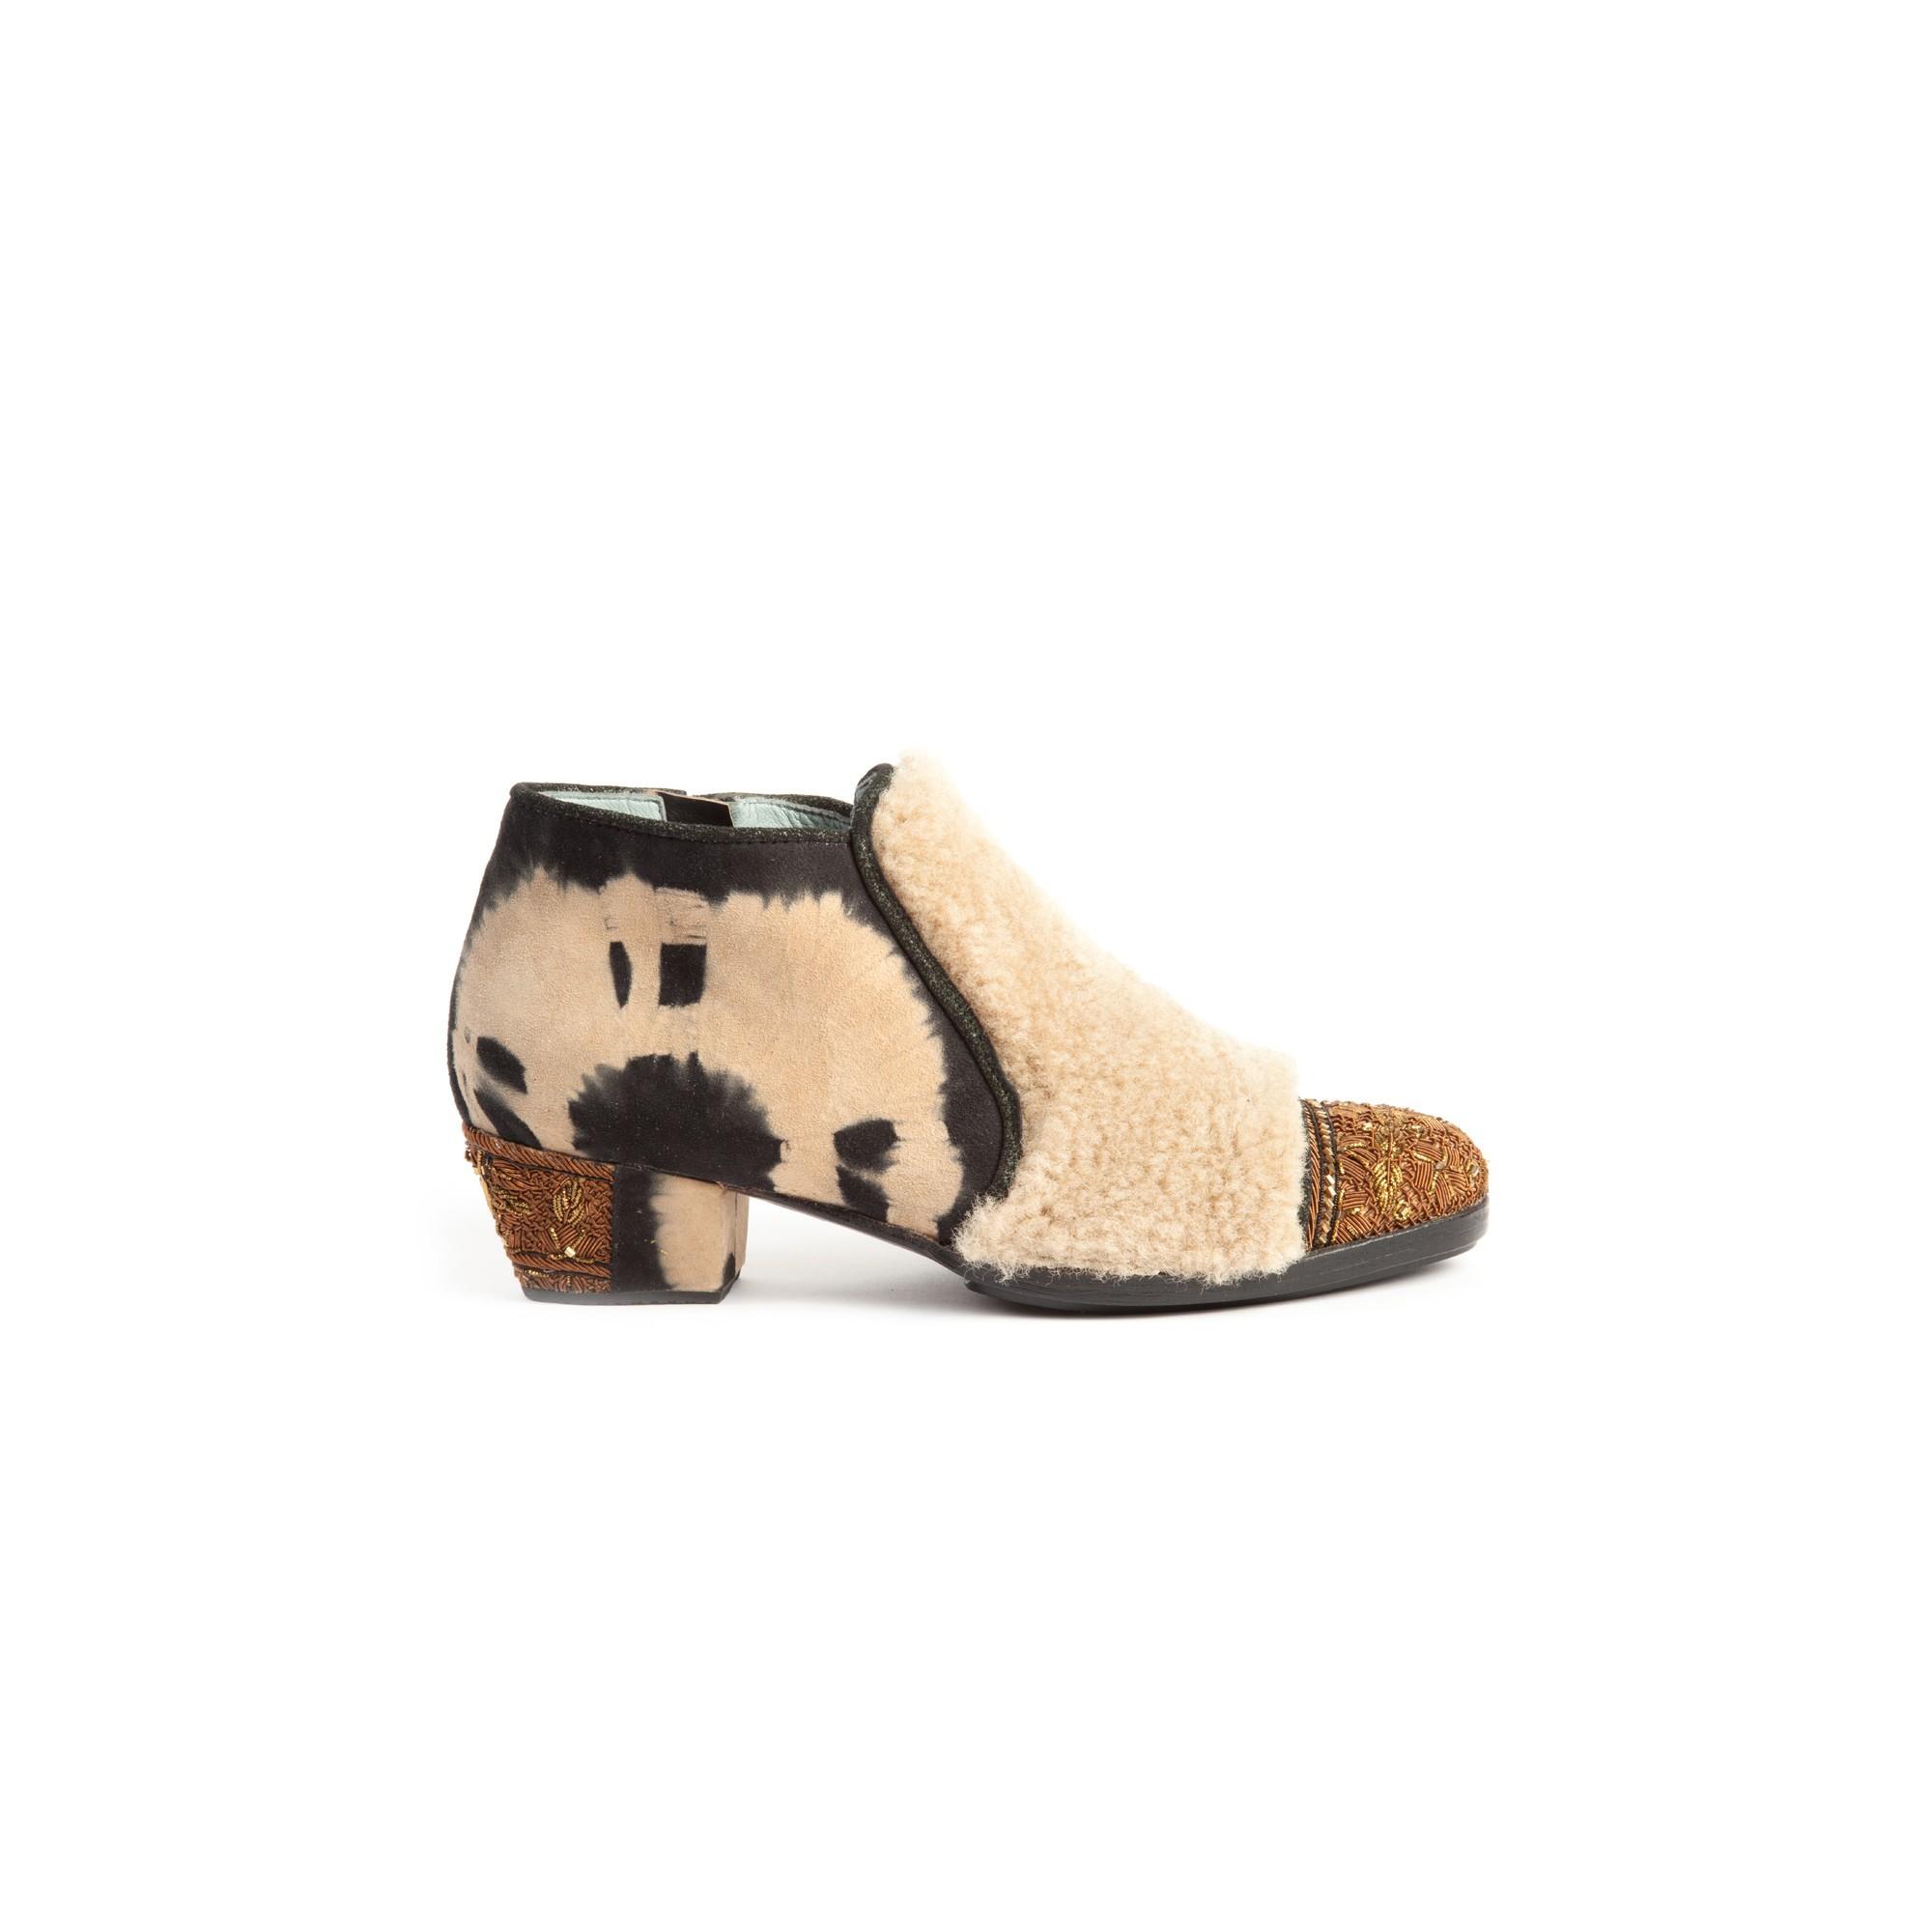 LIGETTI HEEL - shearling+td black beige/khaki